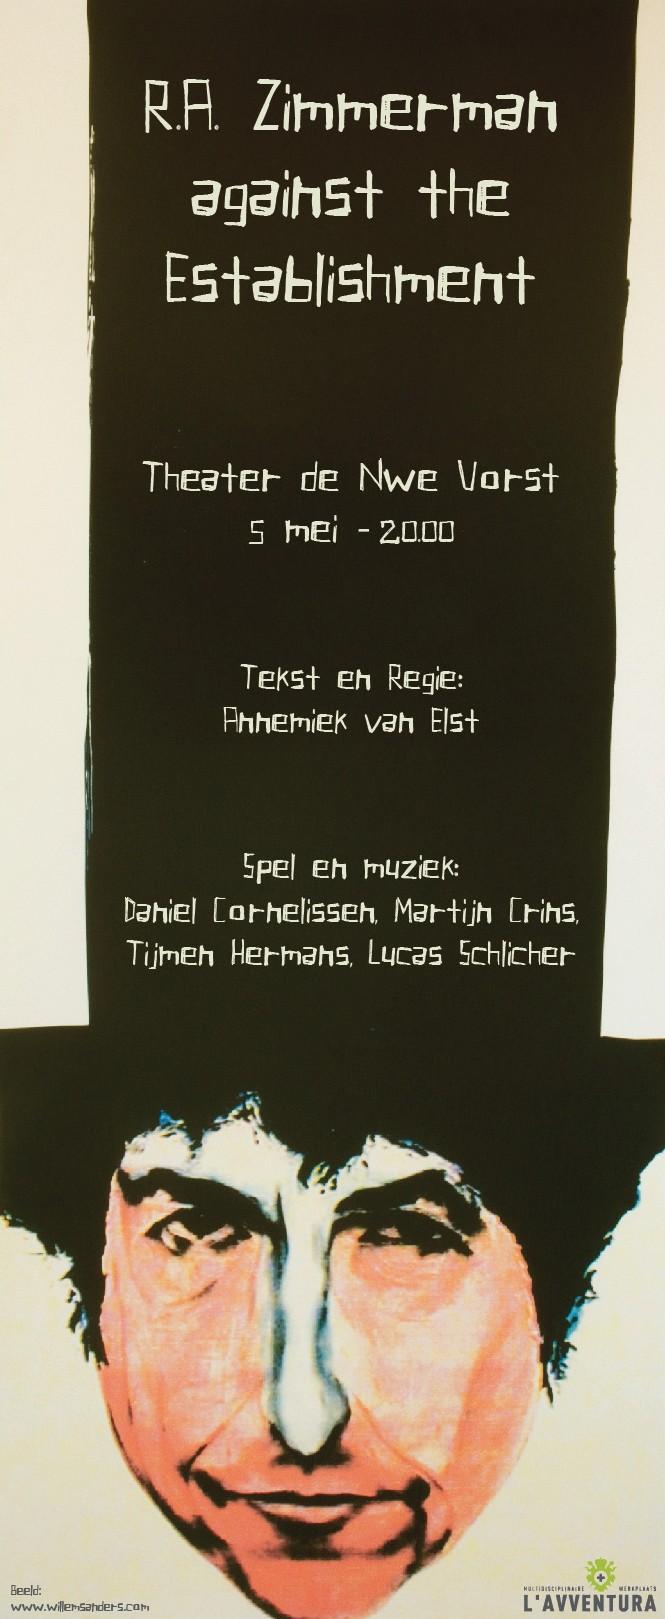 R.A. Zimmerman against the Establishment Written and Directed by Annemiek van Elst For L'Avventura